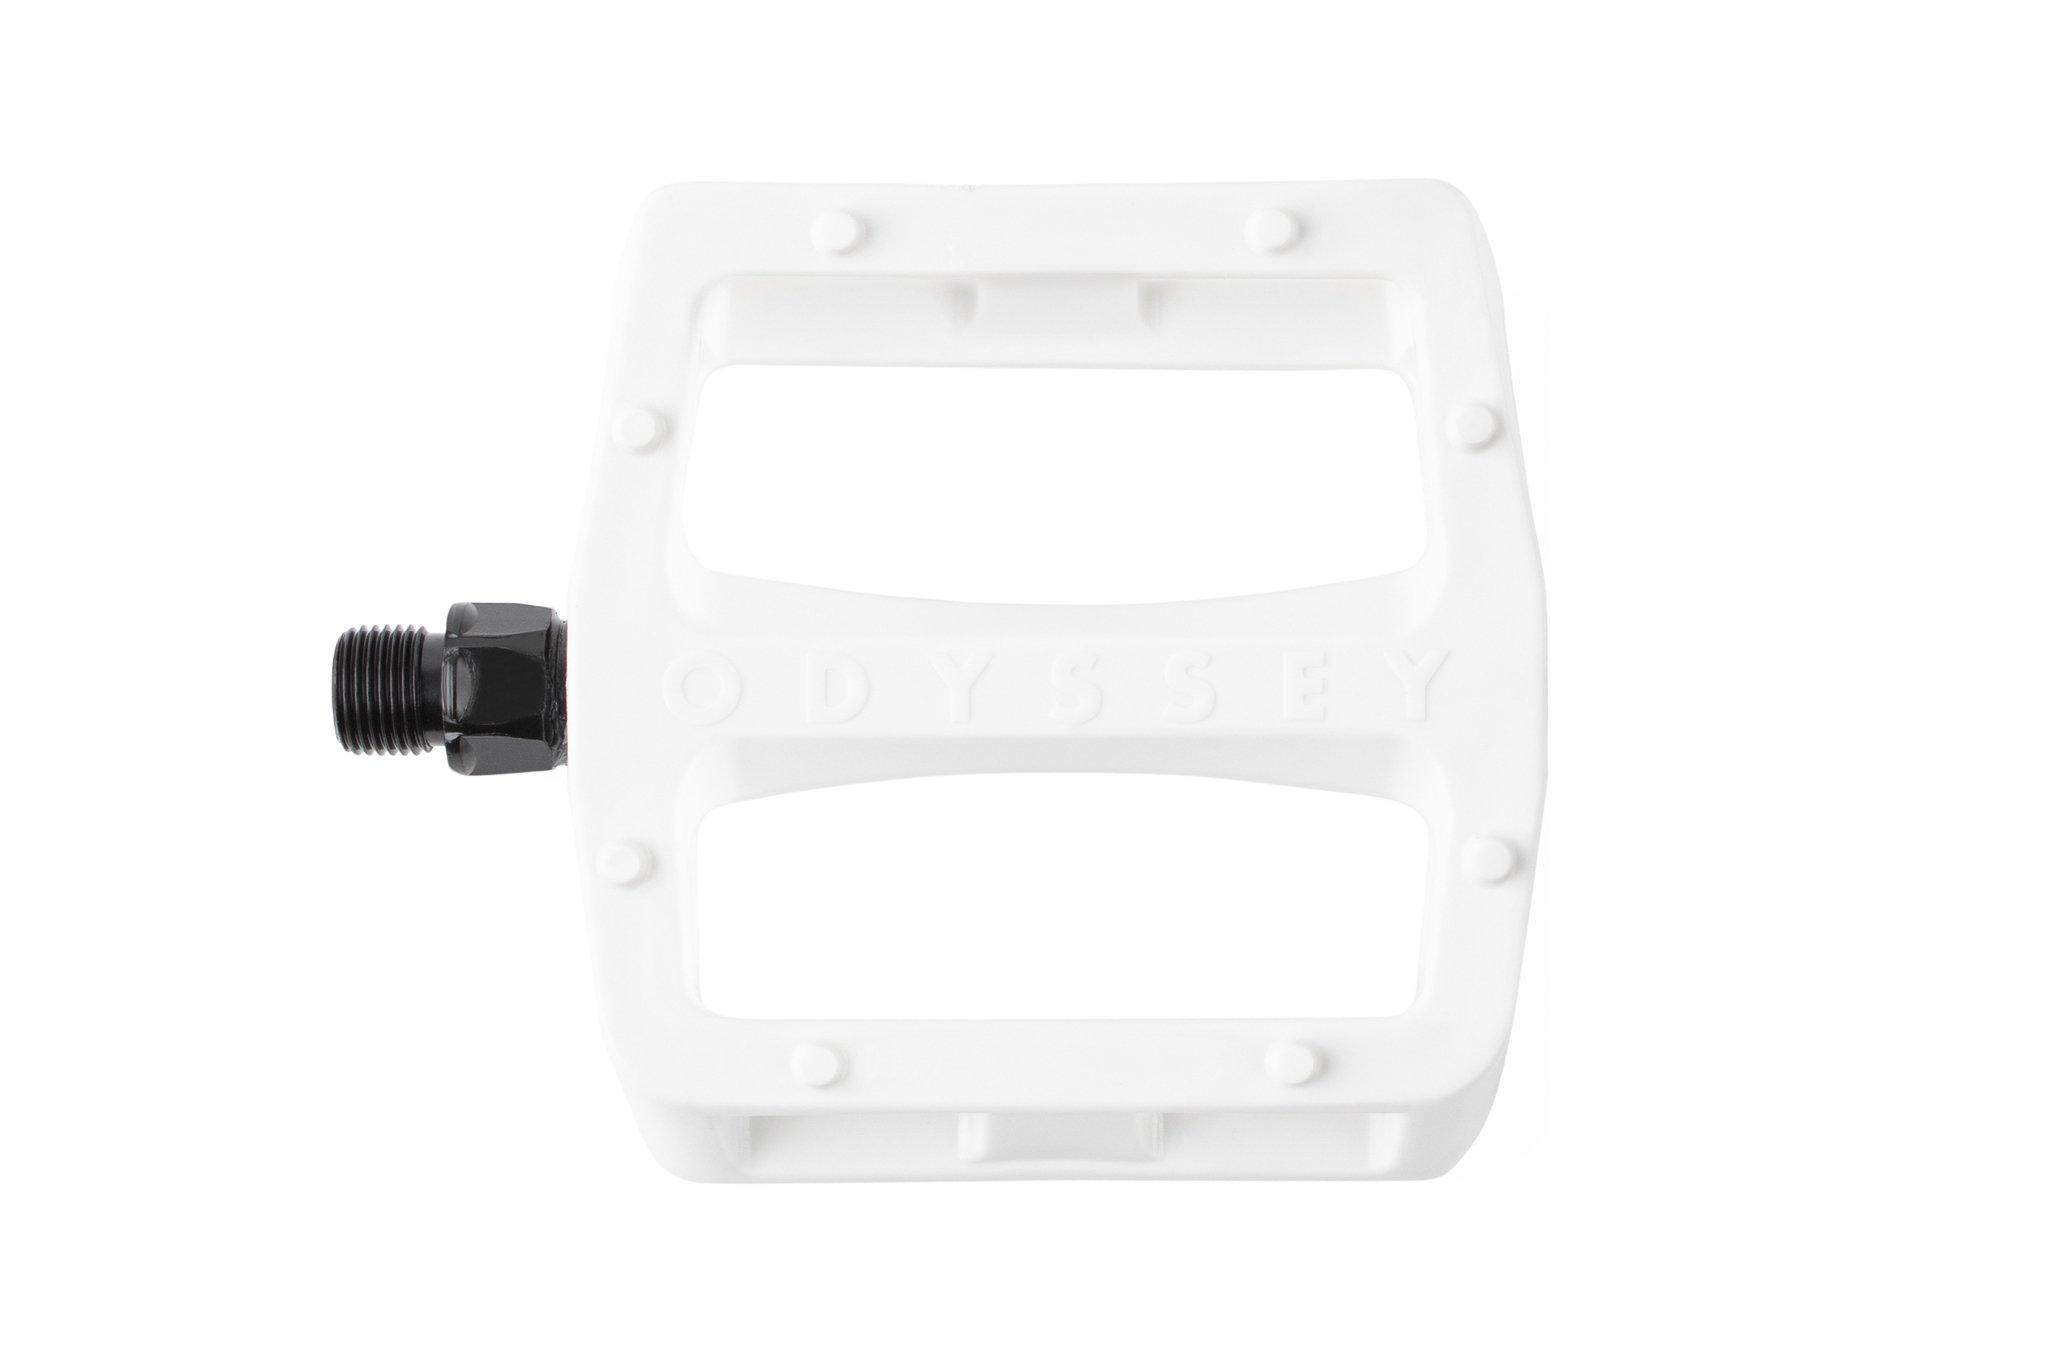 Odyssey BMX Grandstand V2 PC Pedals in weiß